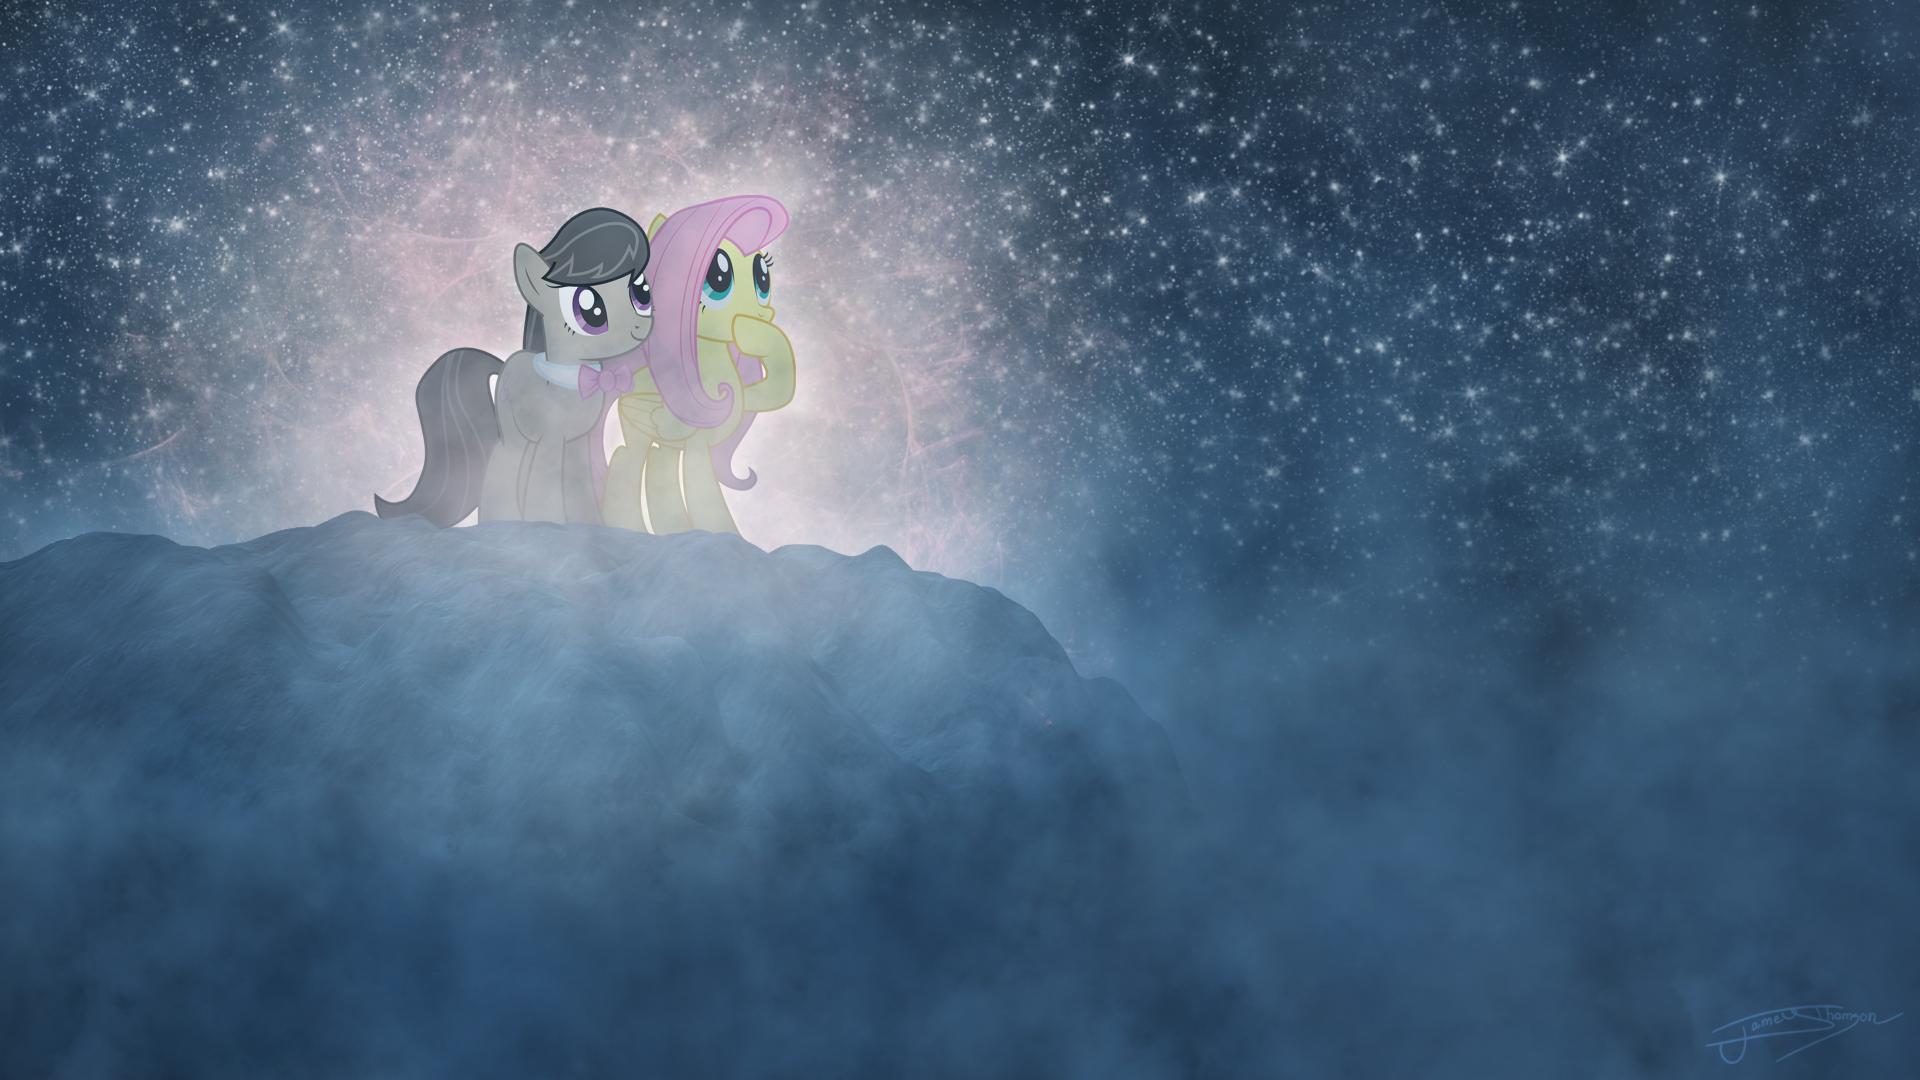 A Night of Stargazing by arcticjuniper, Jamey4 and Quanno3